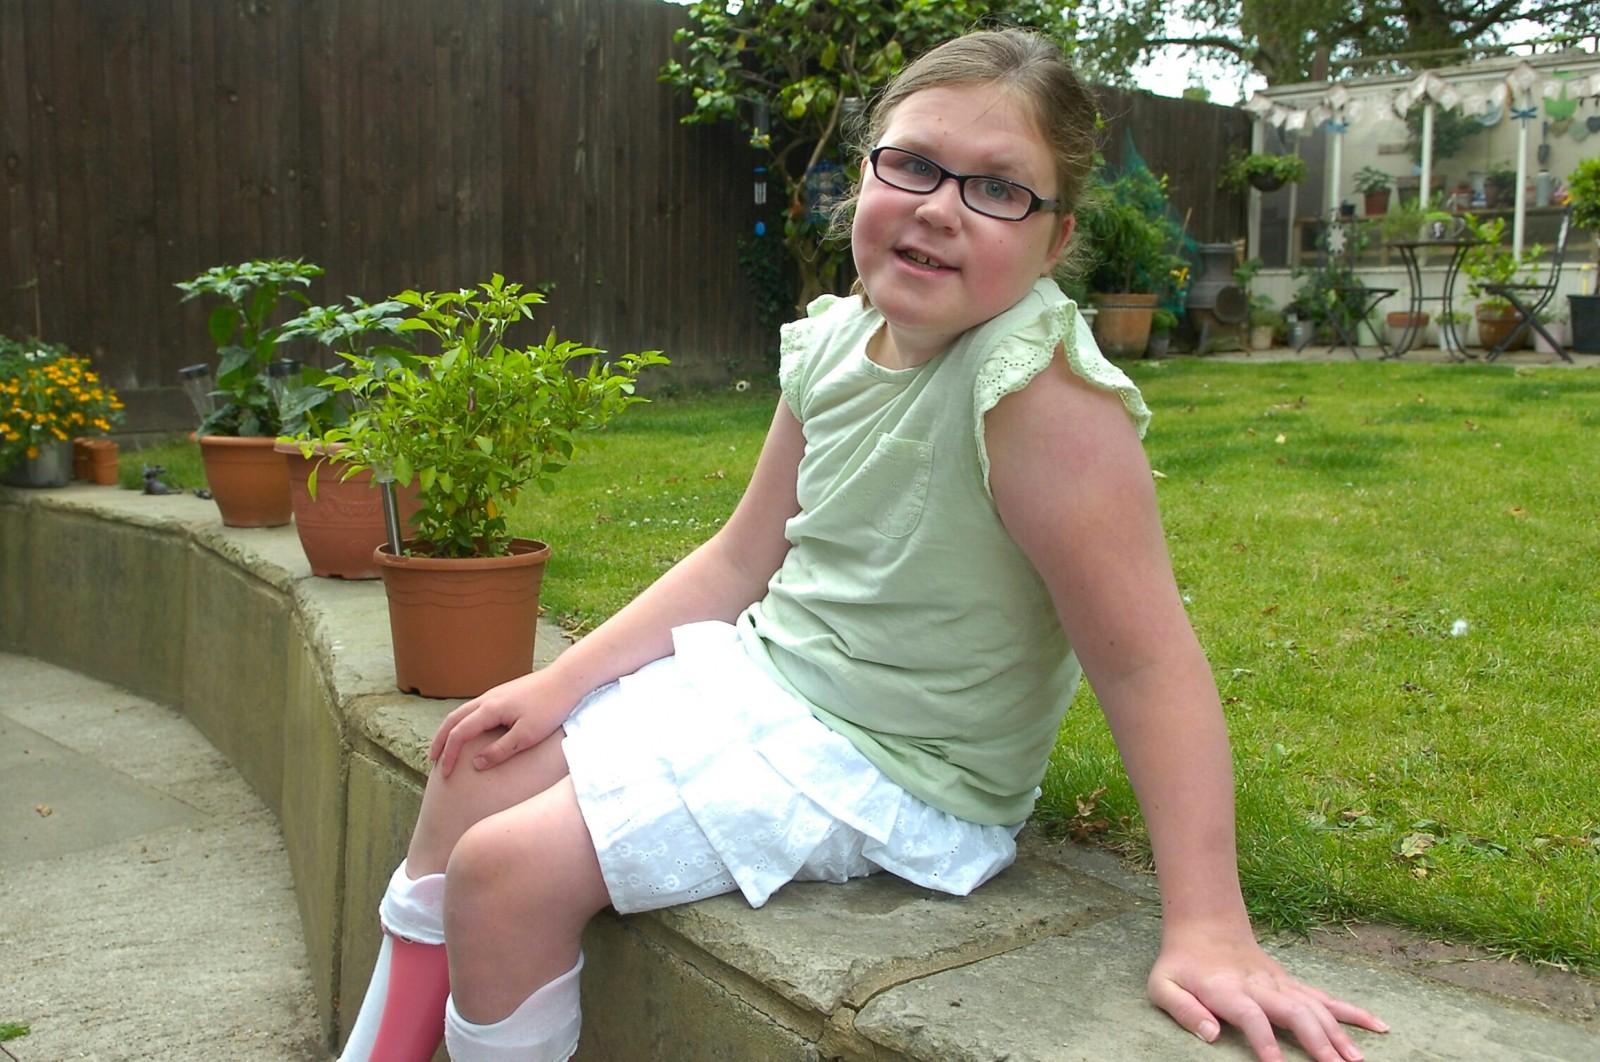 Brave schoolgirl born with brain tumour has feet deliberately broken by doctors